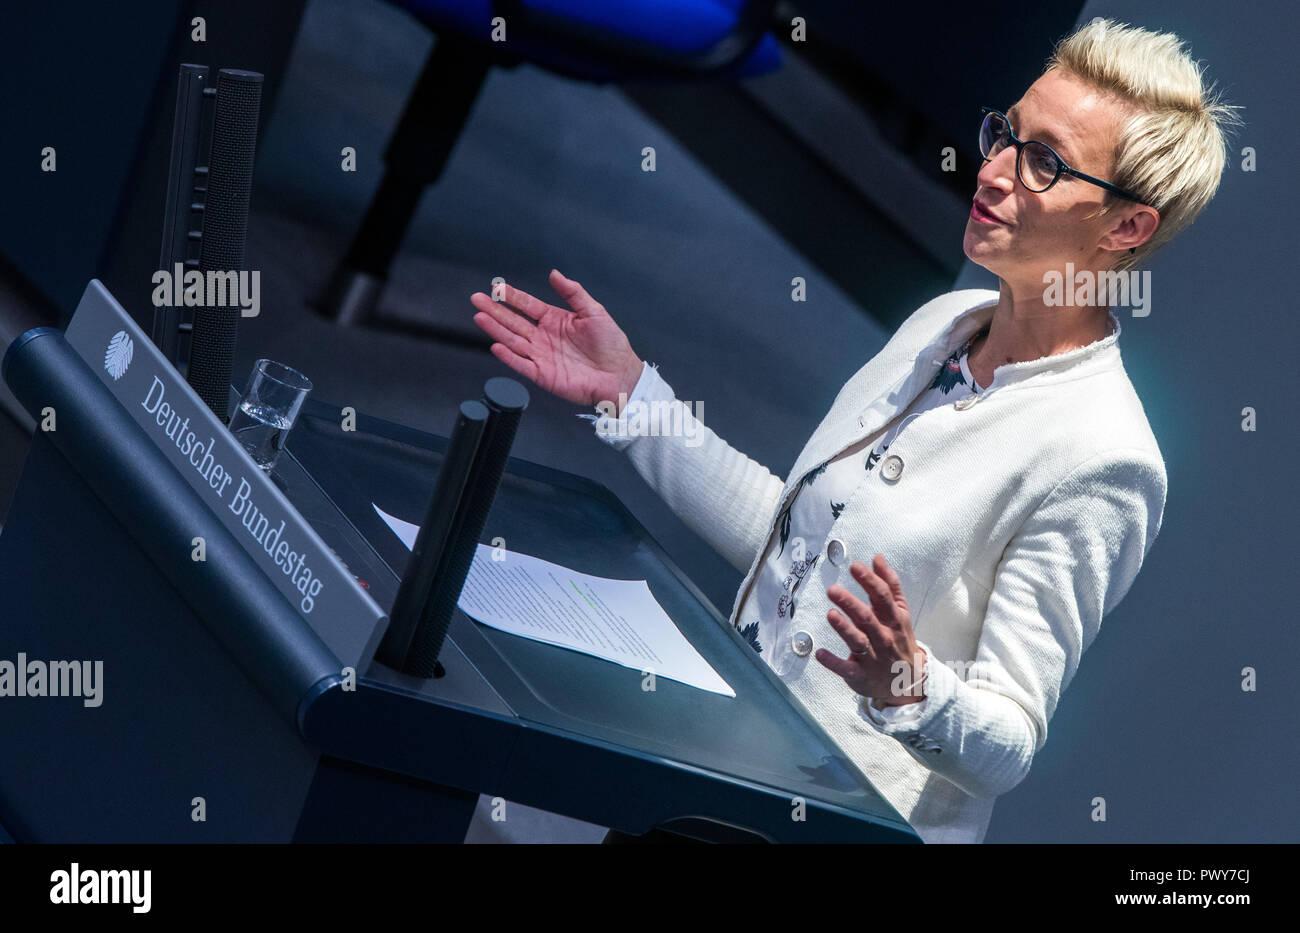 Berlin, Germany. 18th Oct, 2018. Nadine Schön, member of the Bundestag of the CDU/CSU parliamentary group, speaks in the Bundestag. Credit: Jens Büttner/dpa-Zentralbild/dpa/Alamy Live News - Stock Image